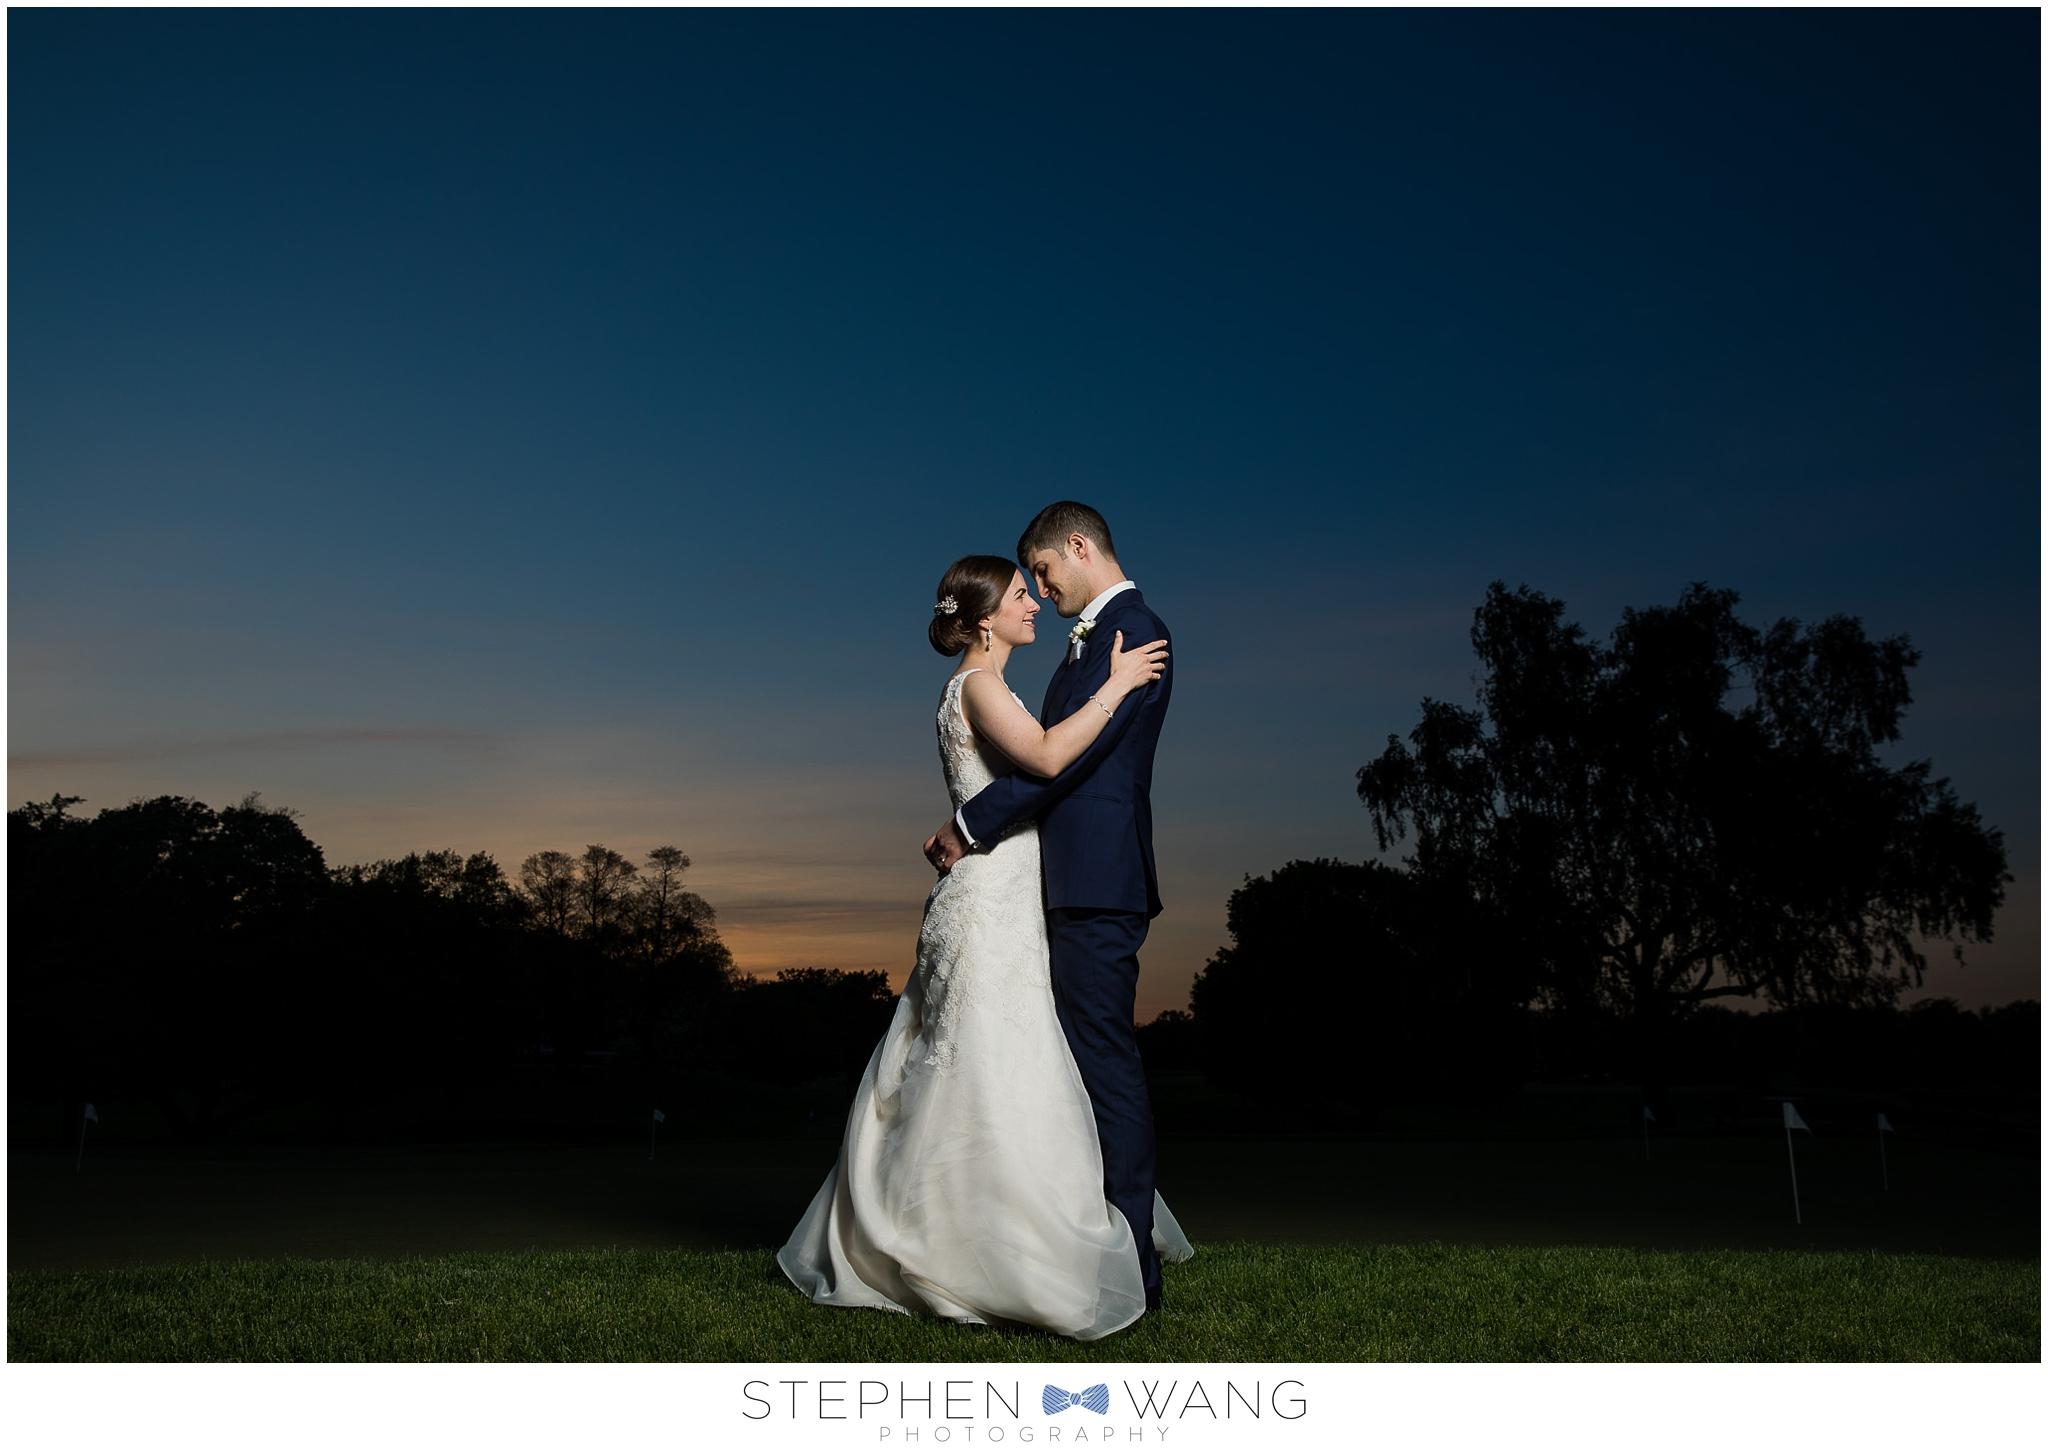 Stephen Wang Photography Shorehaven Norwalk CT Wedding Photographer connecticut shoreline shore haven - 41.jpg